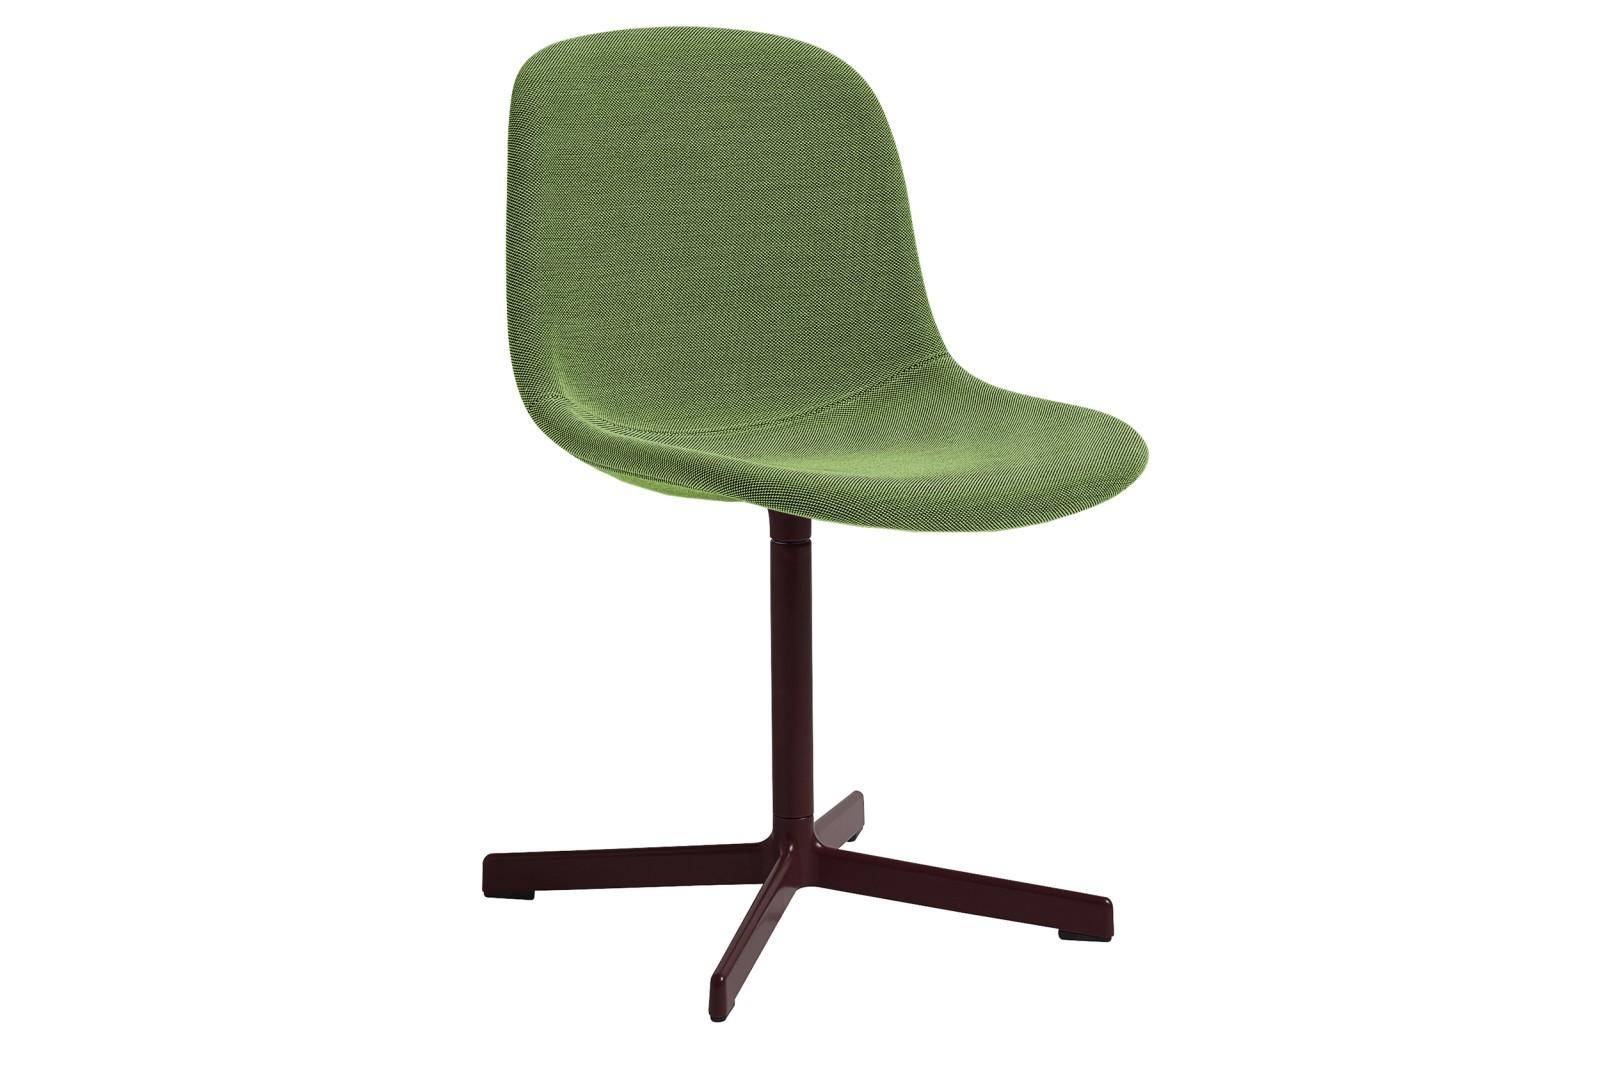 Neu10 Upholstered Chair, Bordeaux Base Steelcut 2 110